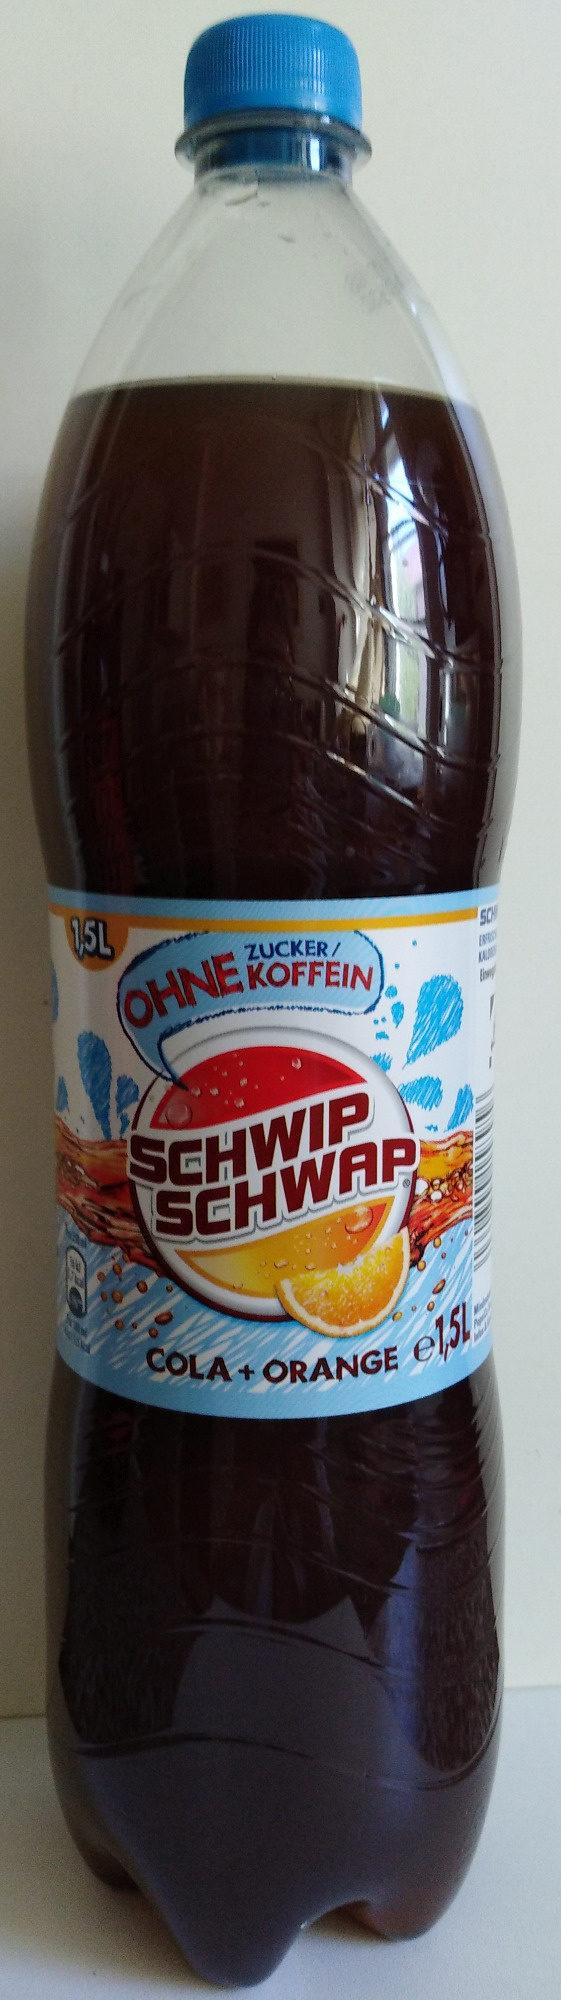 Cola + Orange ohne Koffein - Product